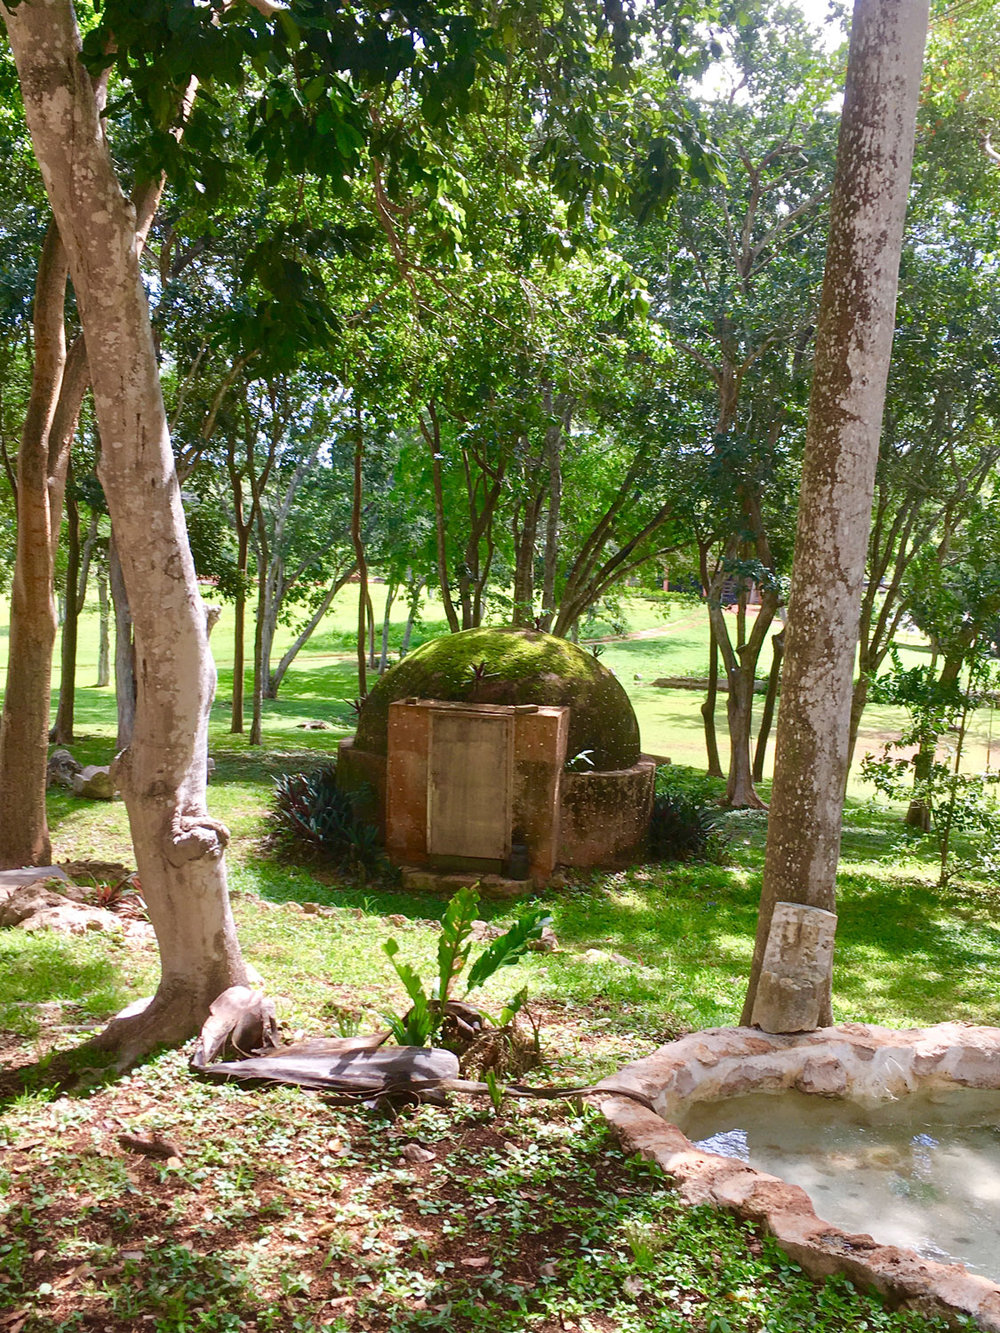 Temazcal (a Mayan sweat lodge) in the hotel garden.